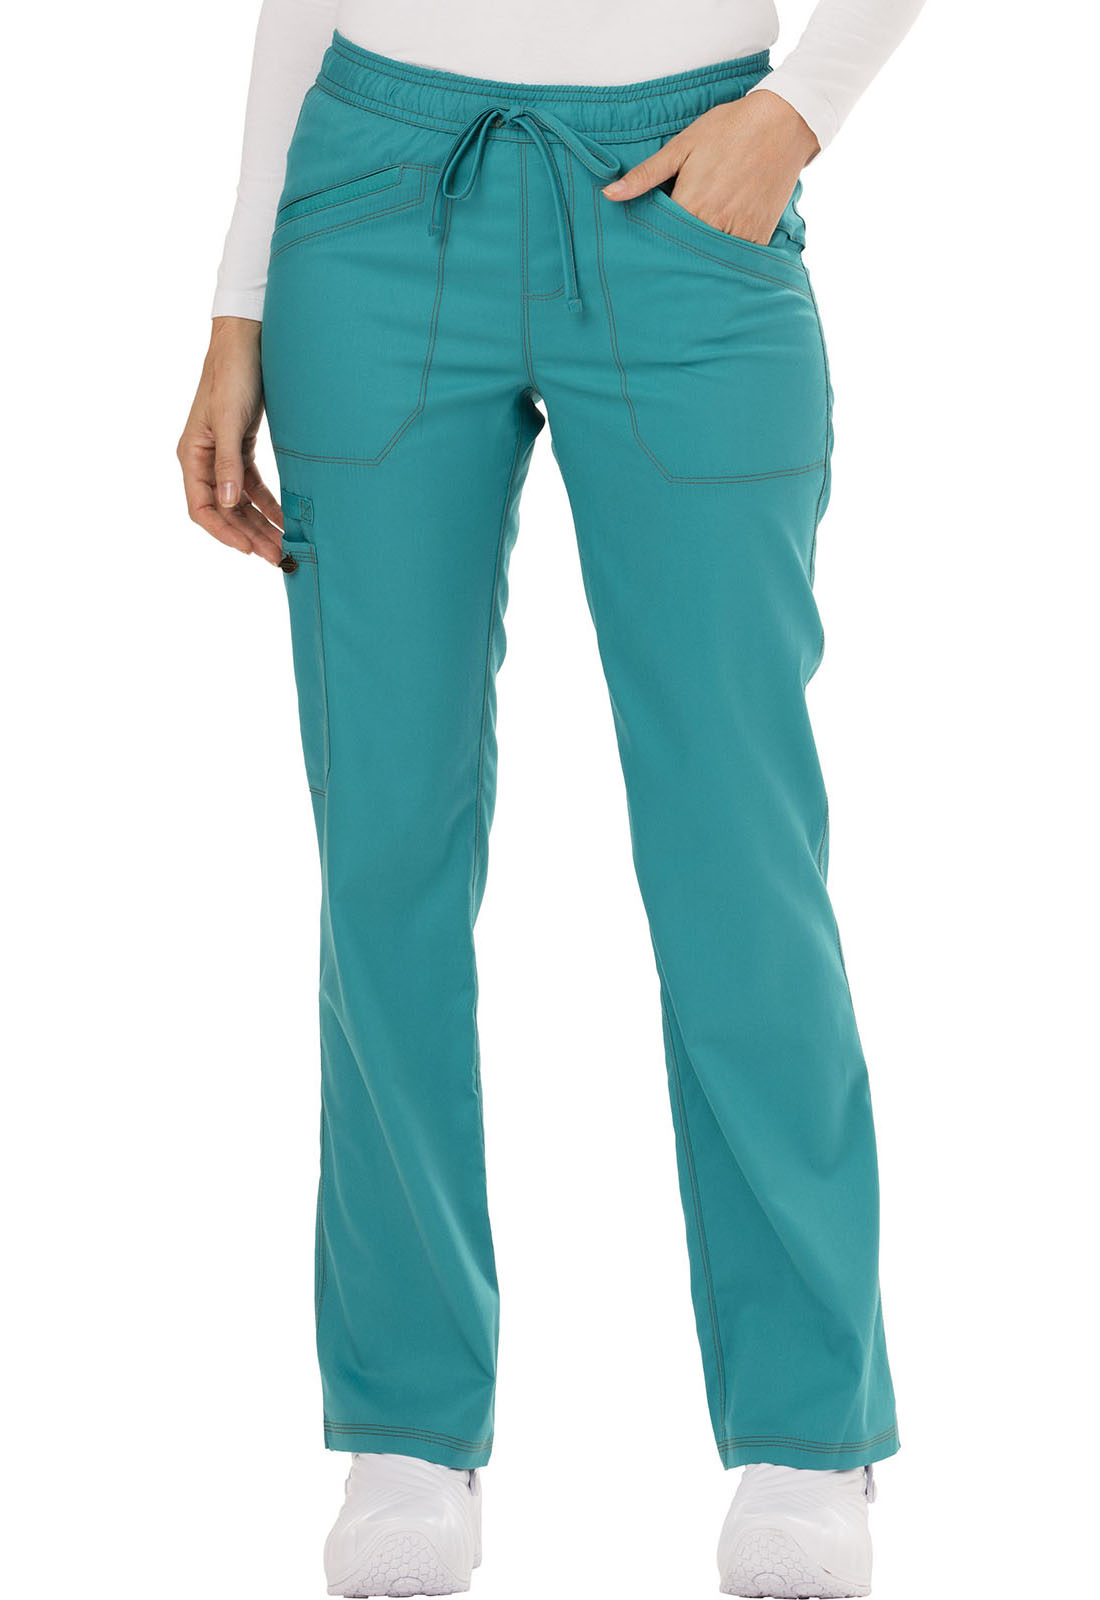 1ddc5c98a81 Essence Mid Rise Straight Leg Drawstring Pant in Teal Blue DK106P ...